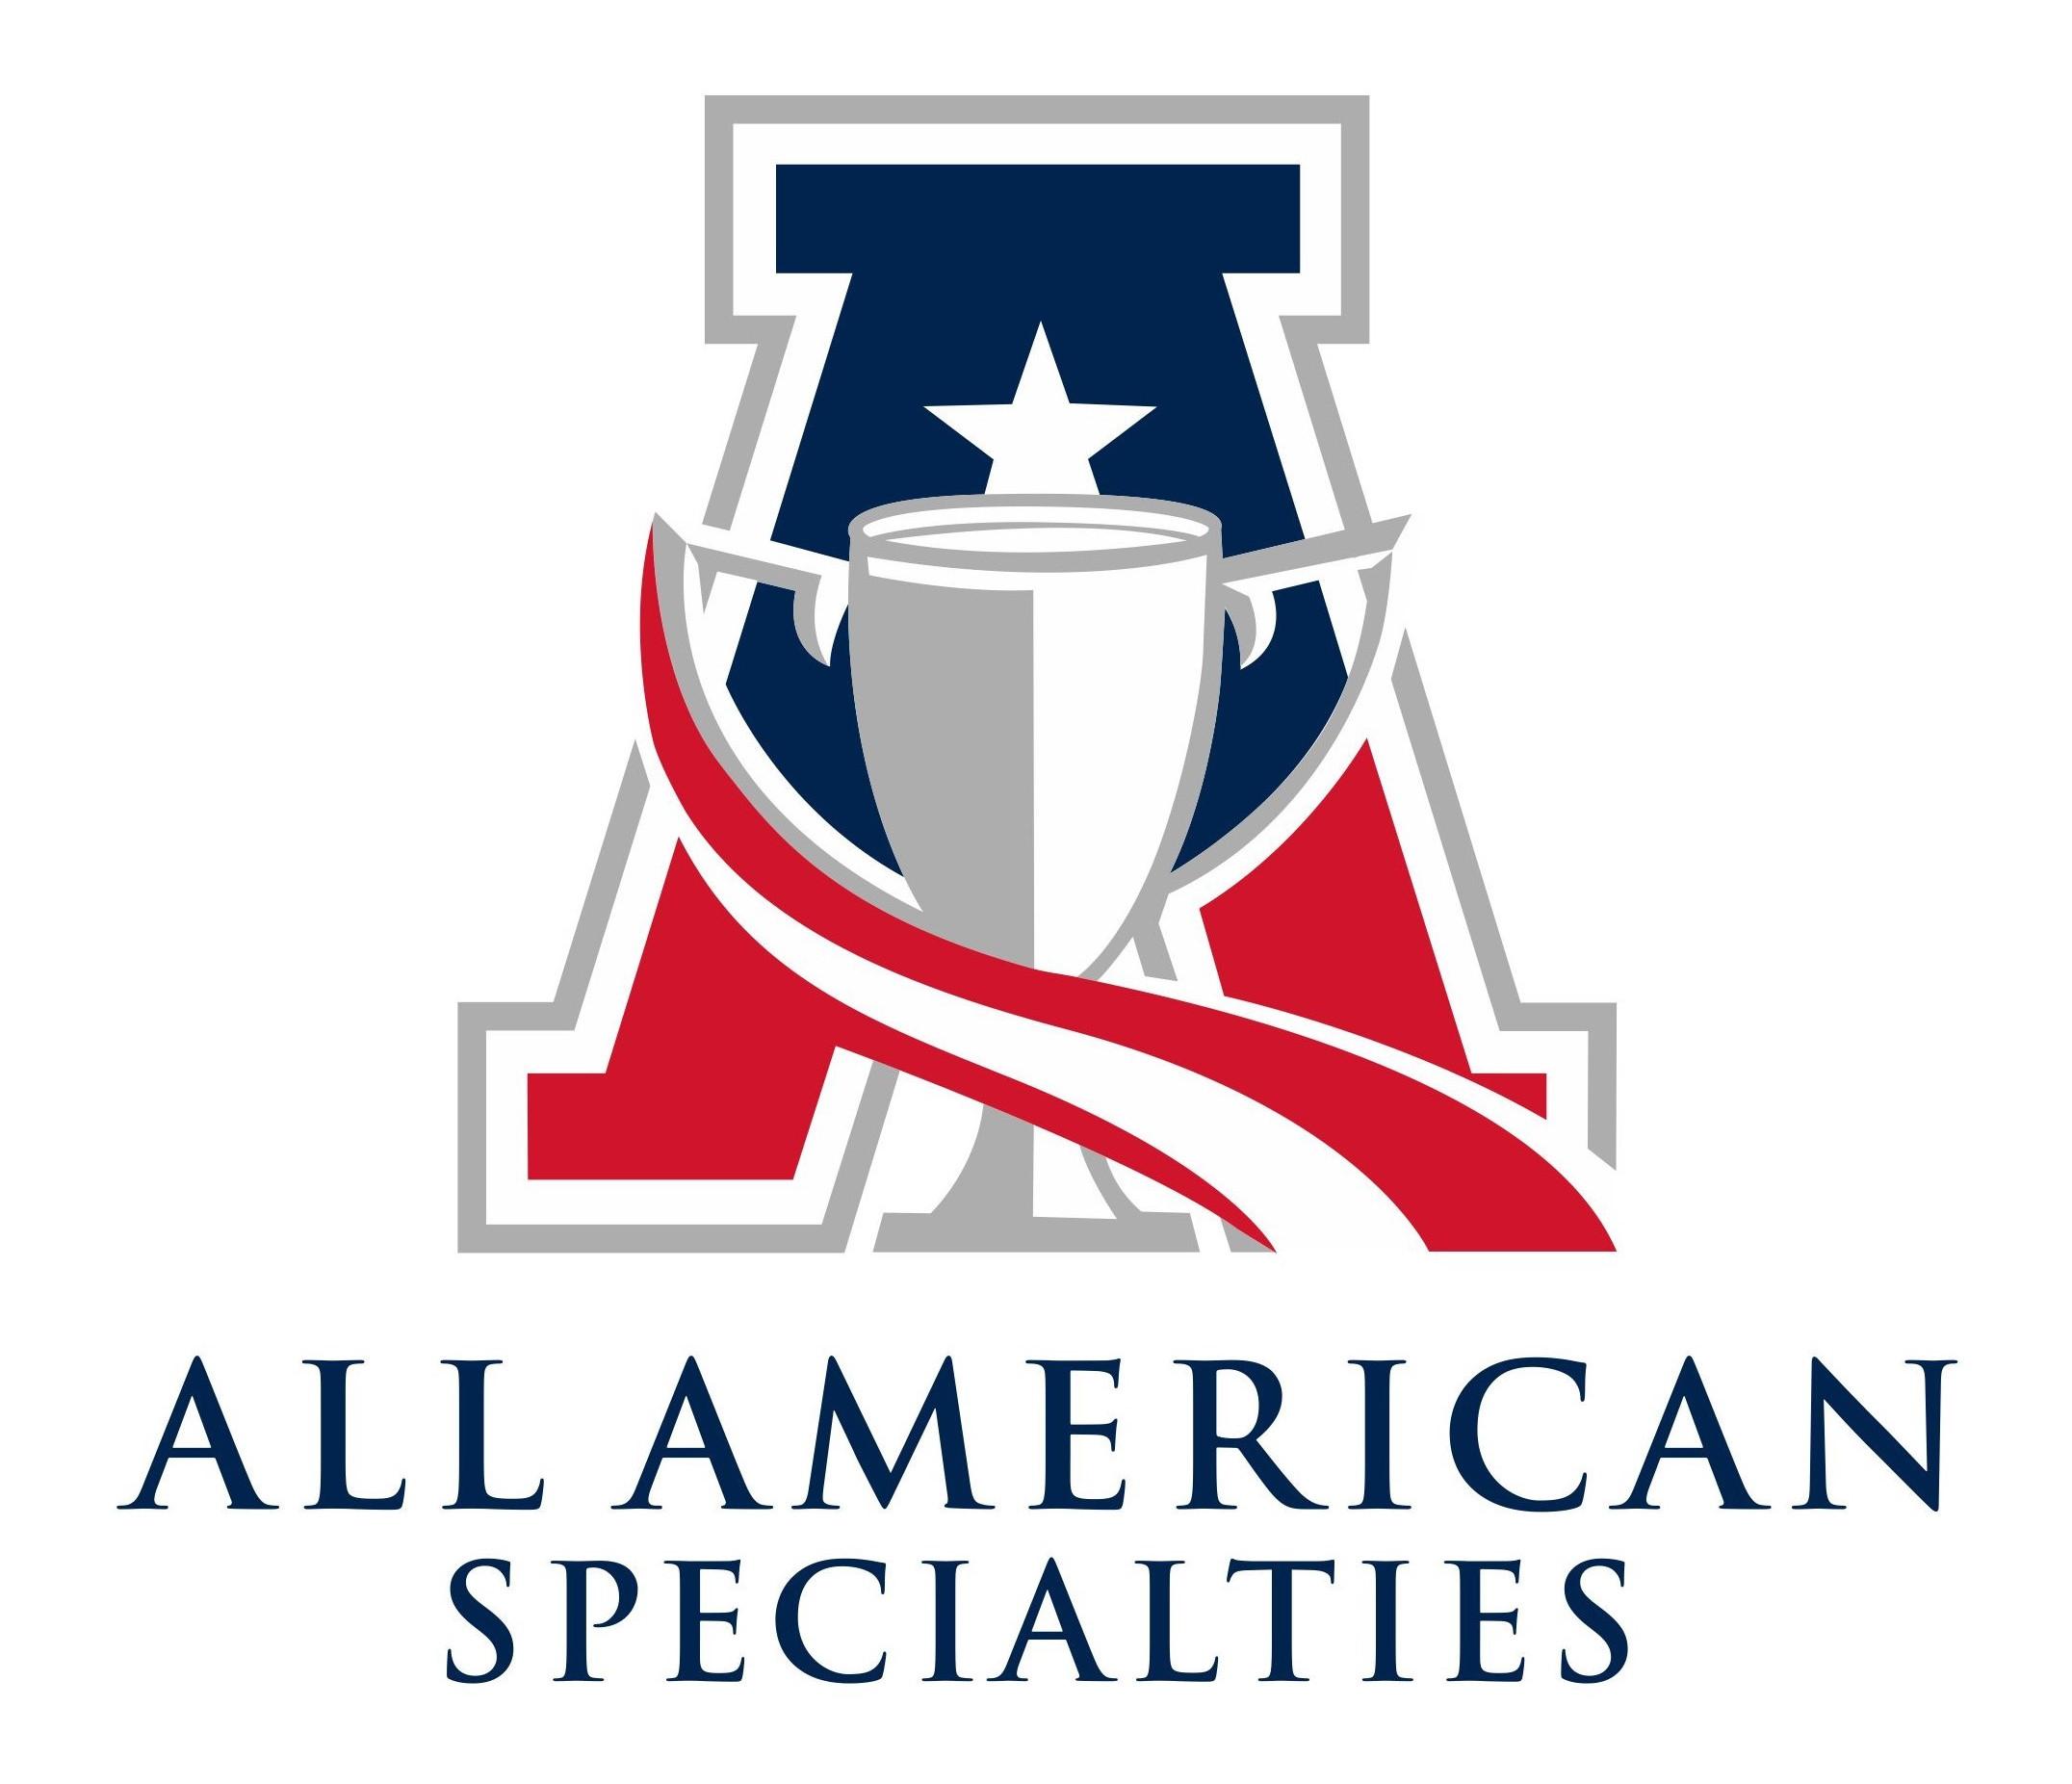 All American Specialties